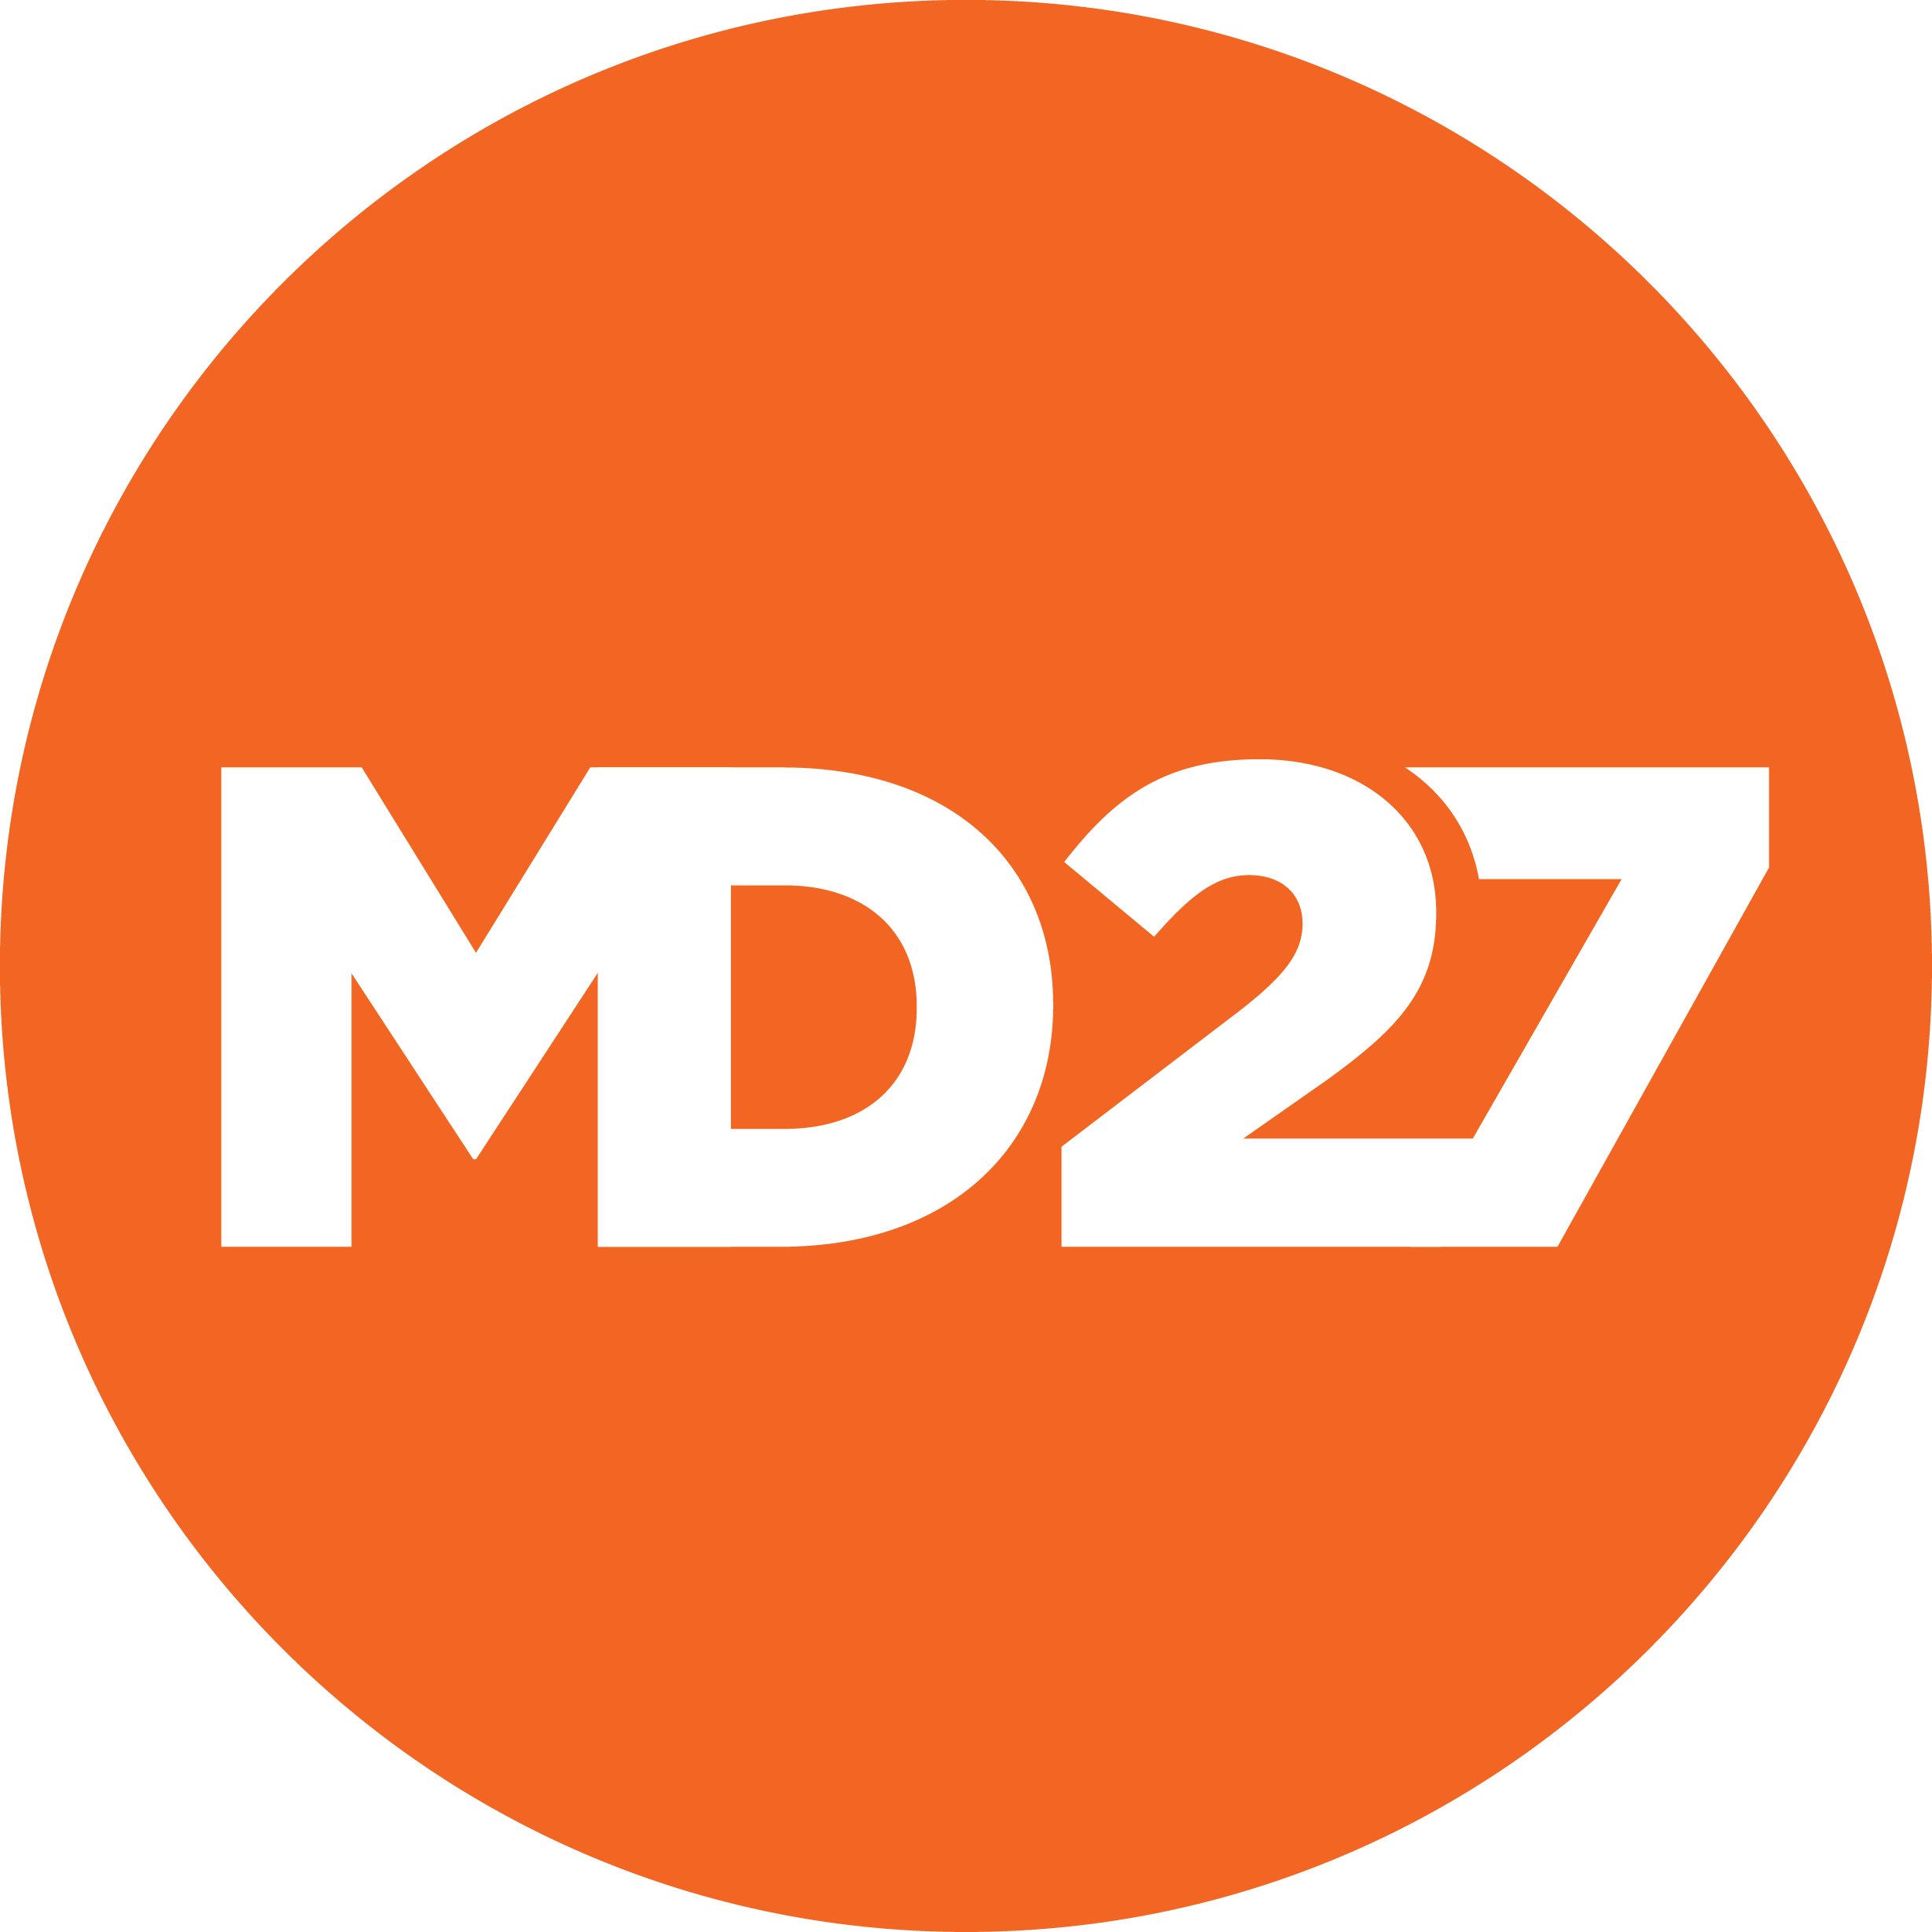 md27 logo